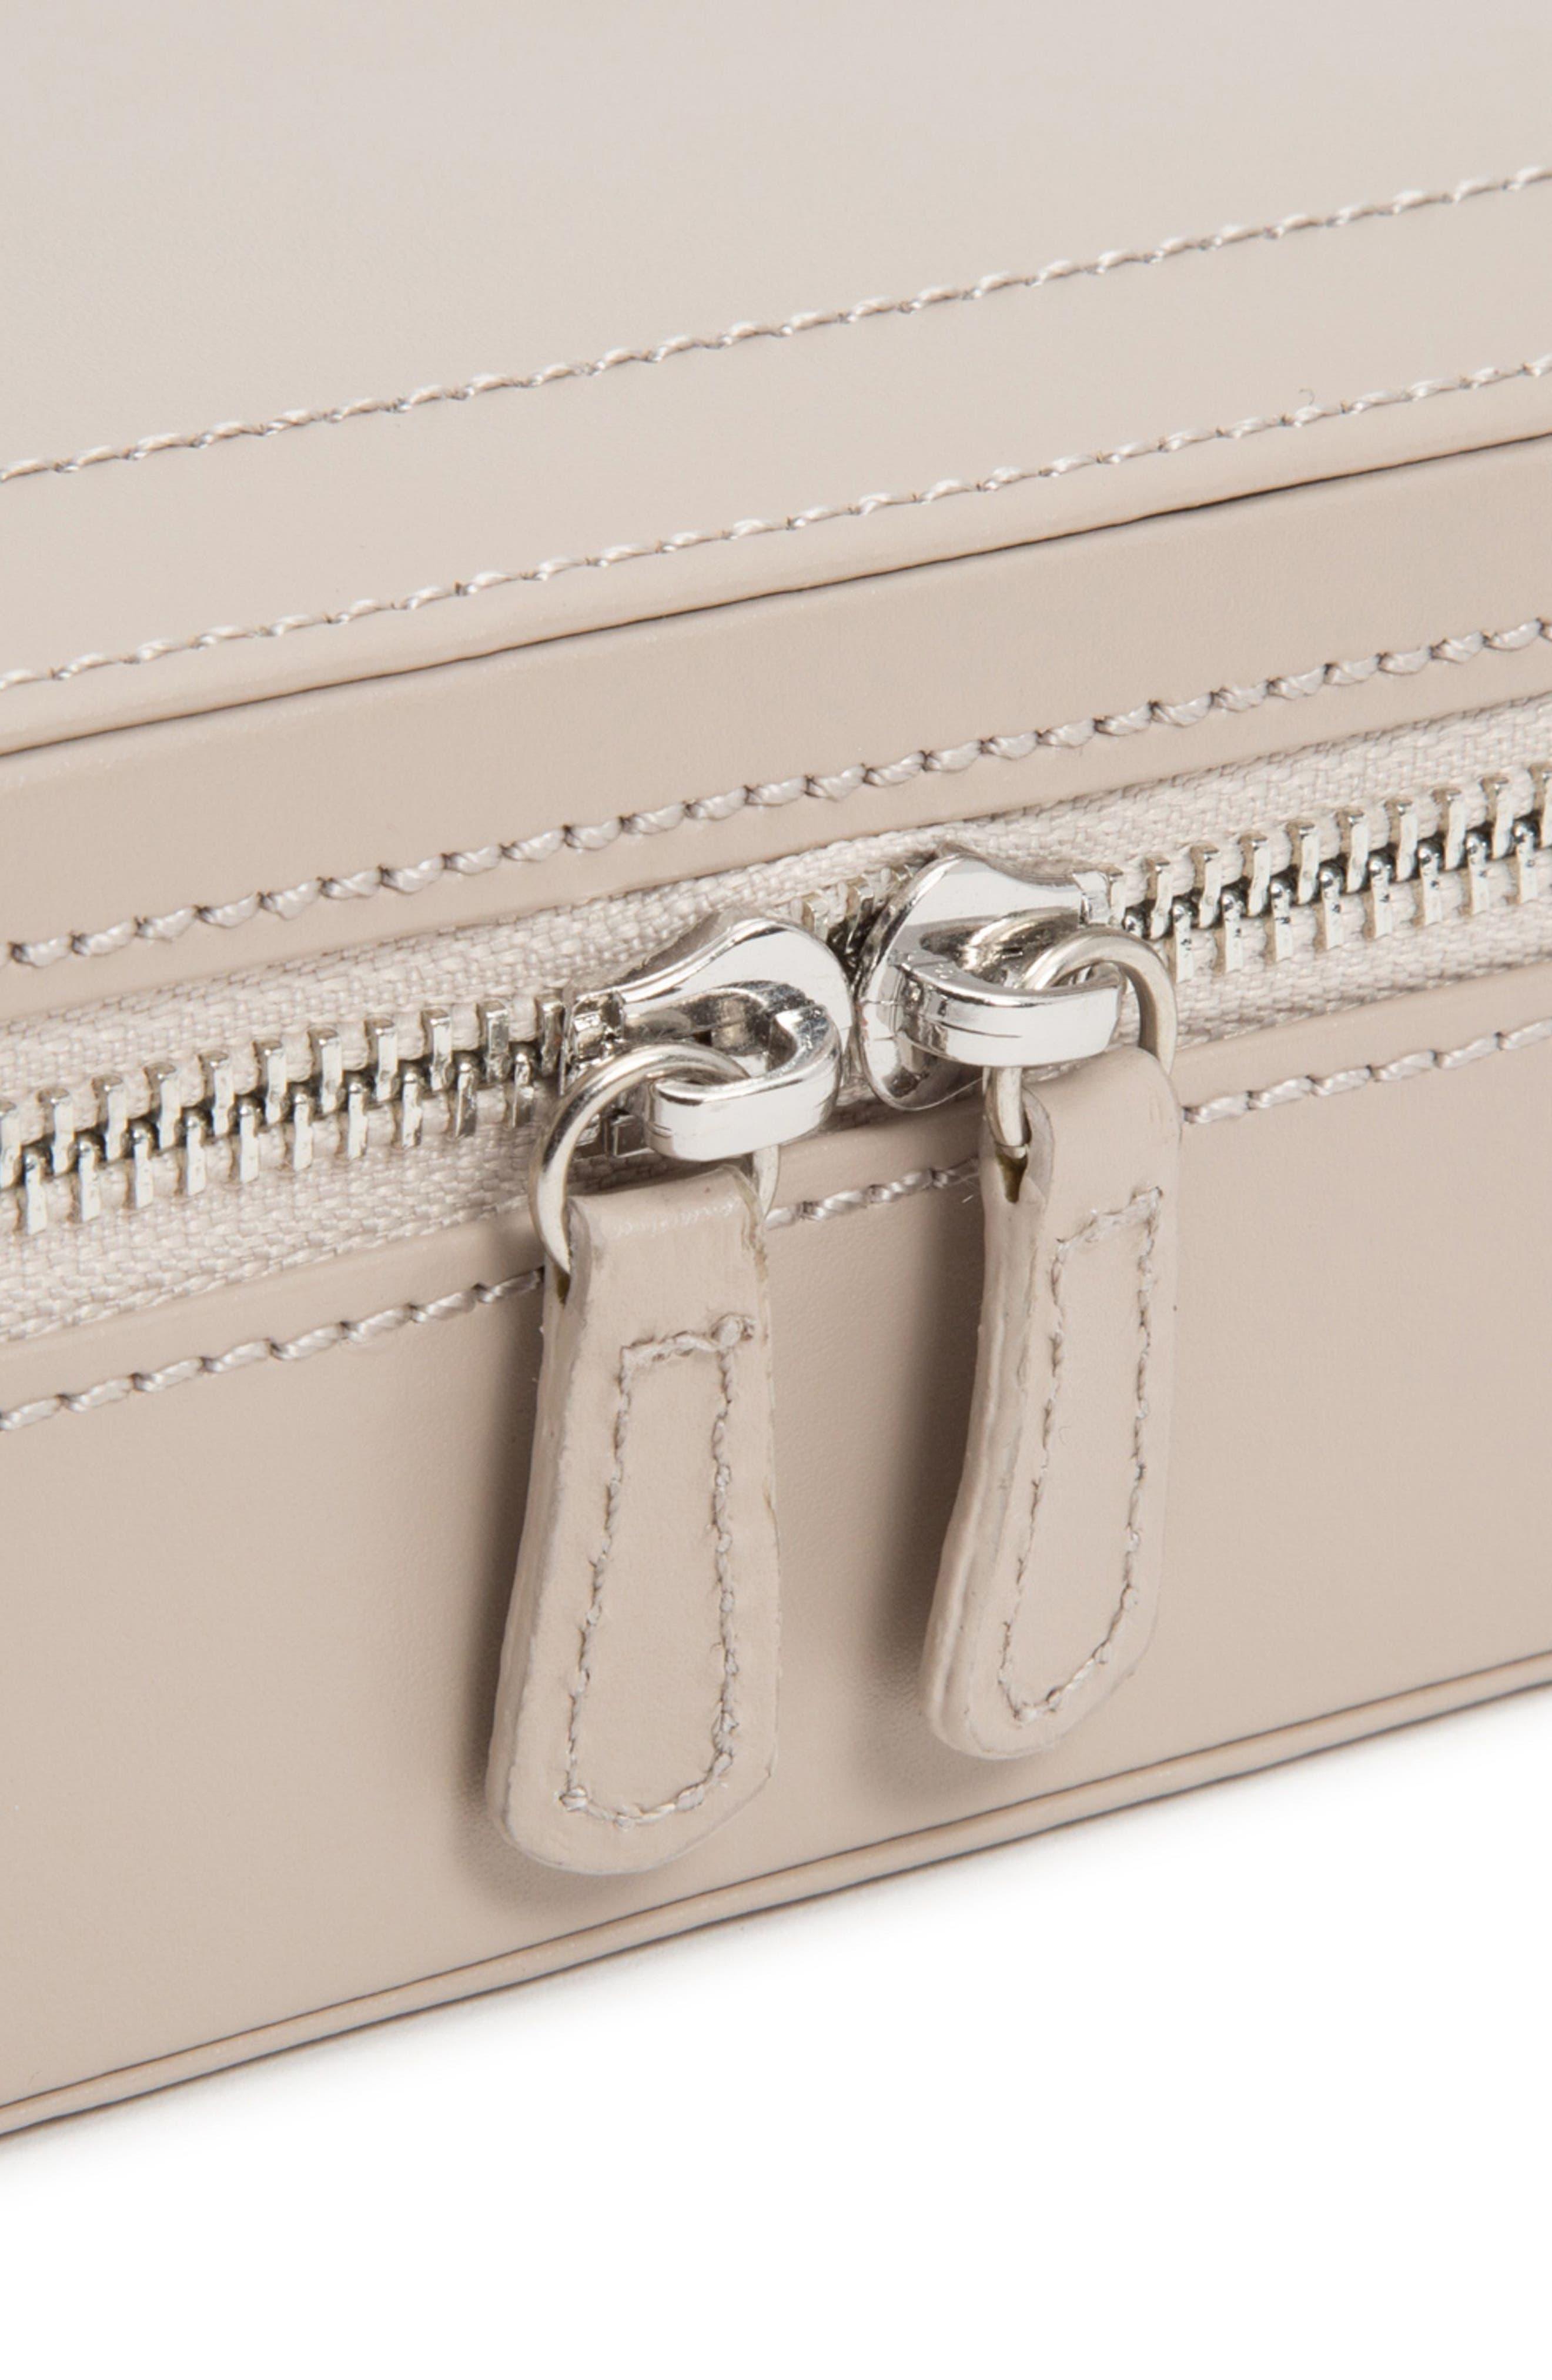 Sophia Rectangle Zip Case,                             Alternate thumbnail 3, color,                             MINK